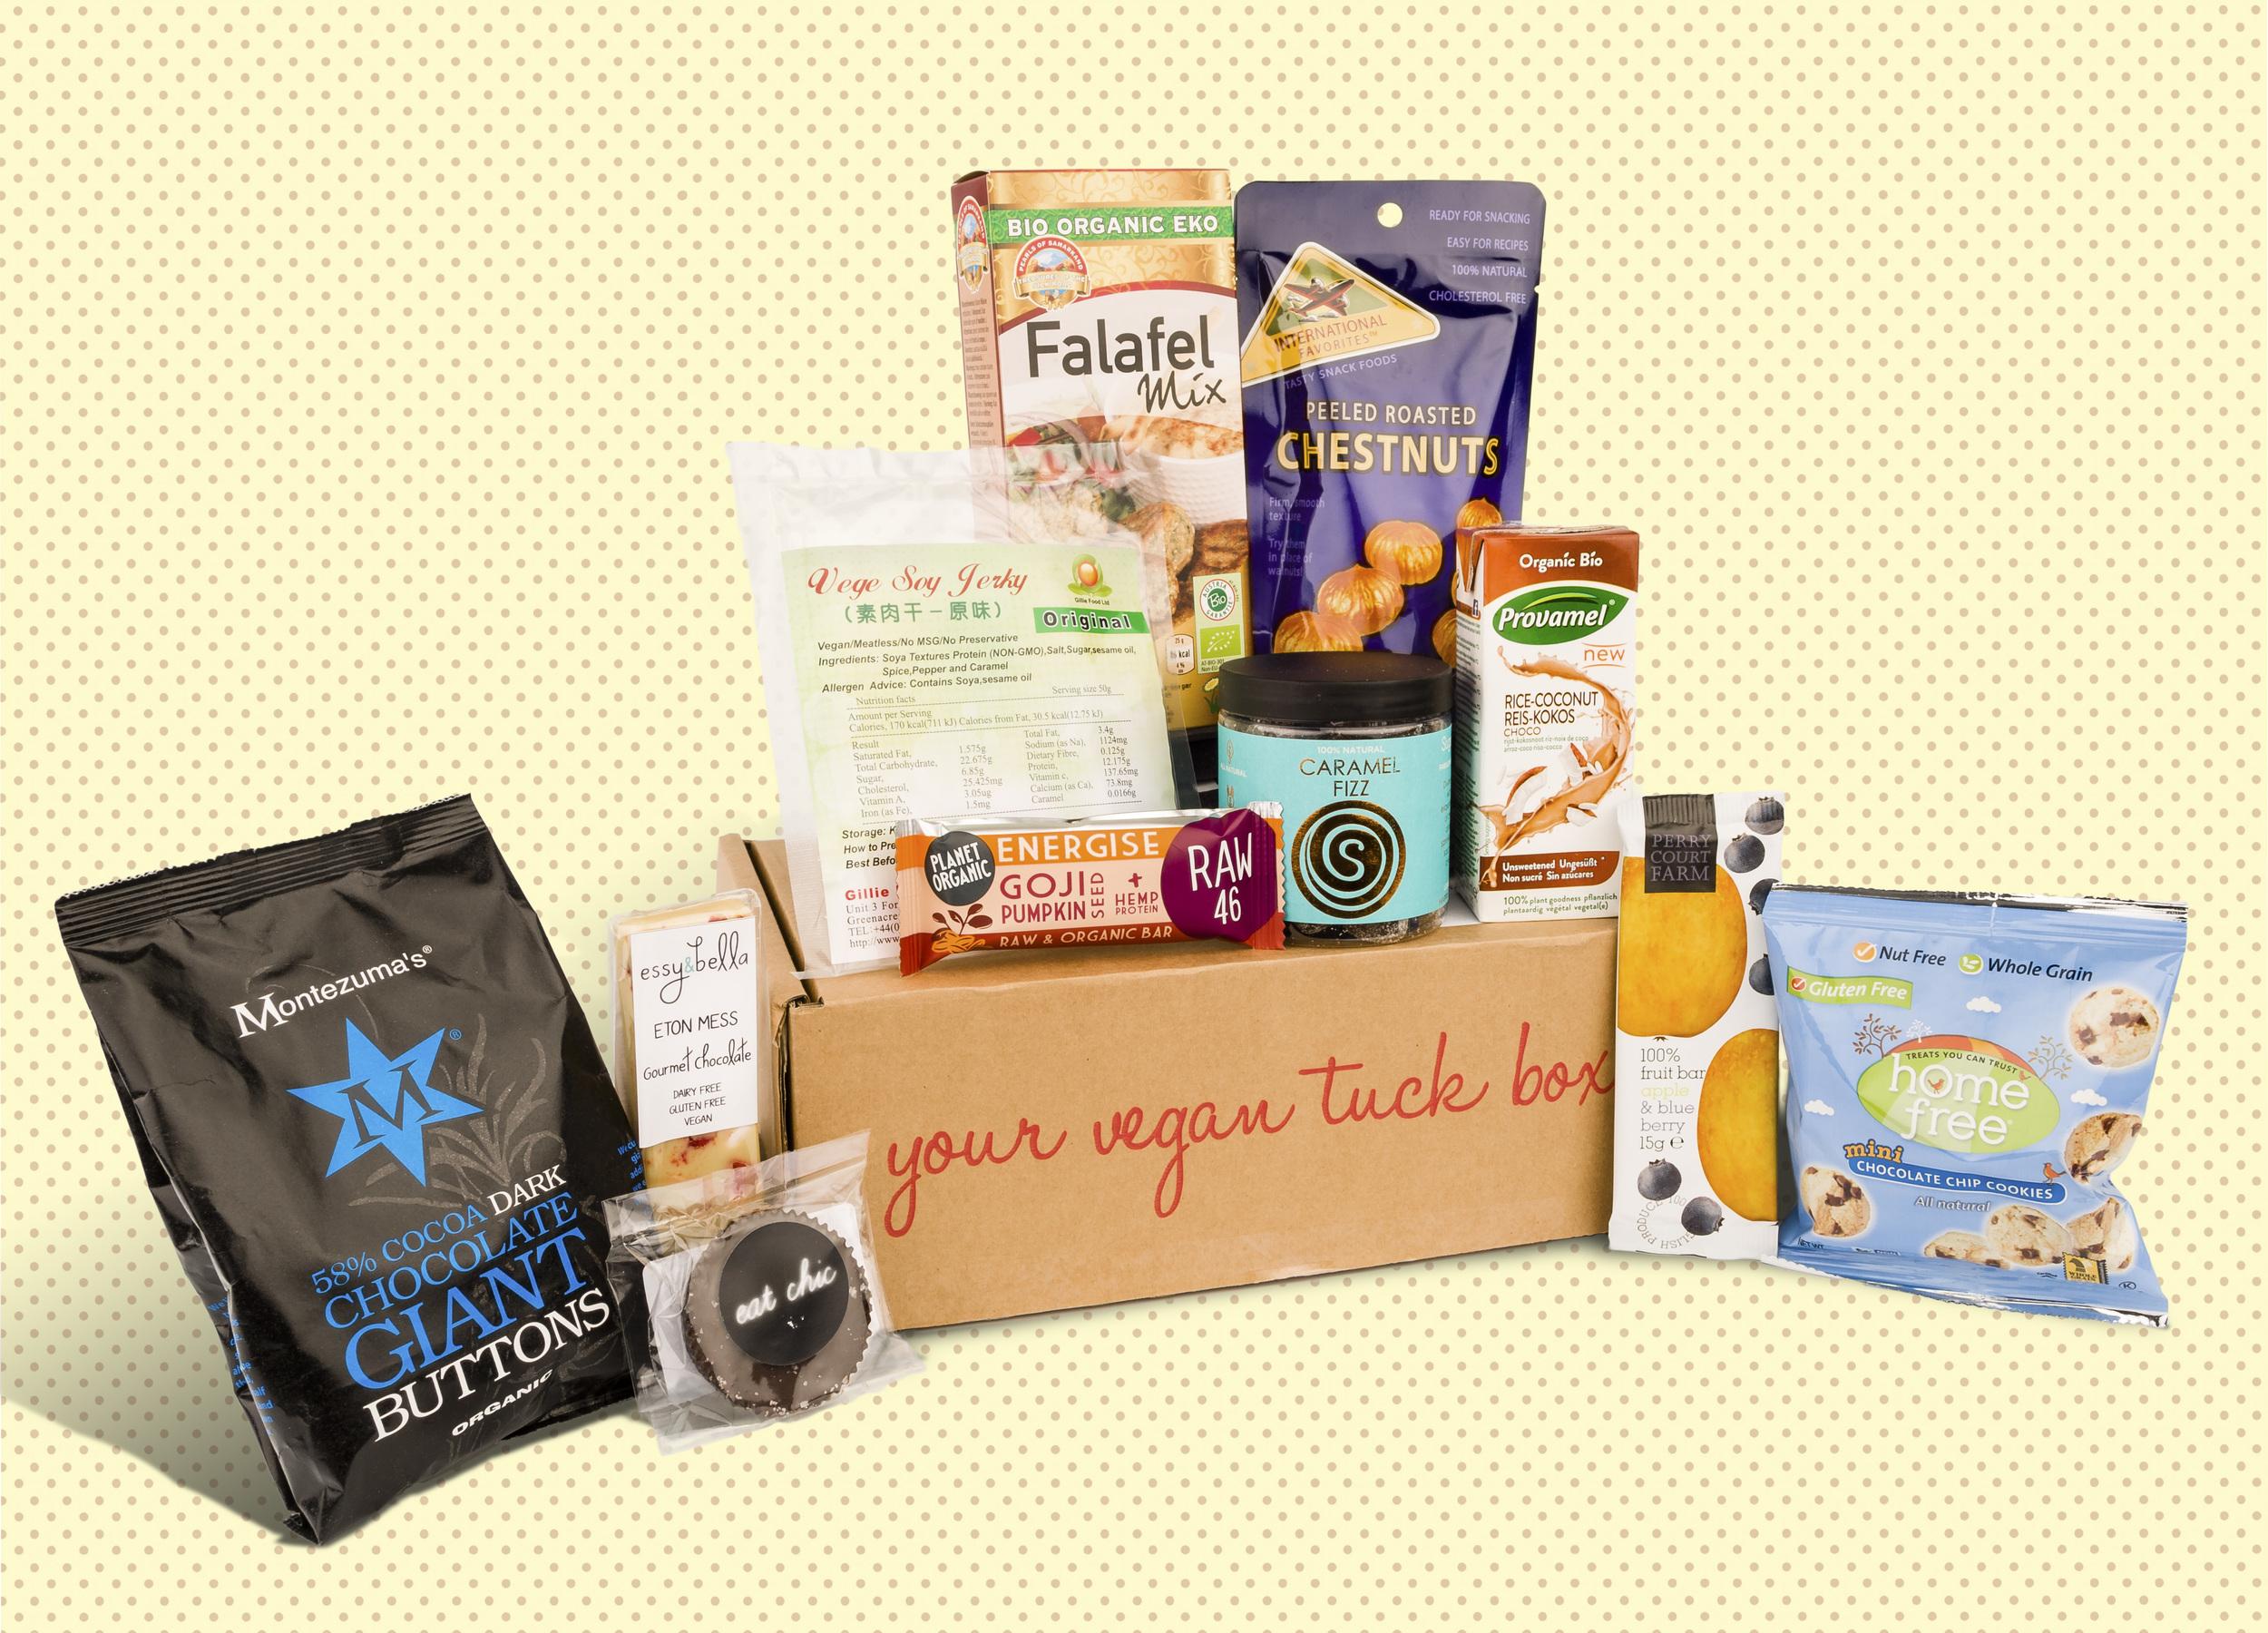 Vegan Tuck Box of July 2015